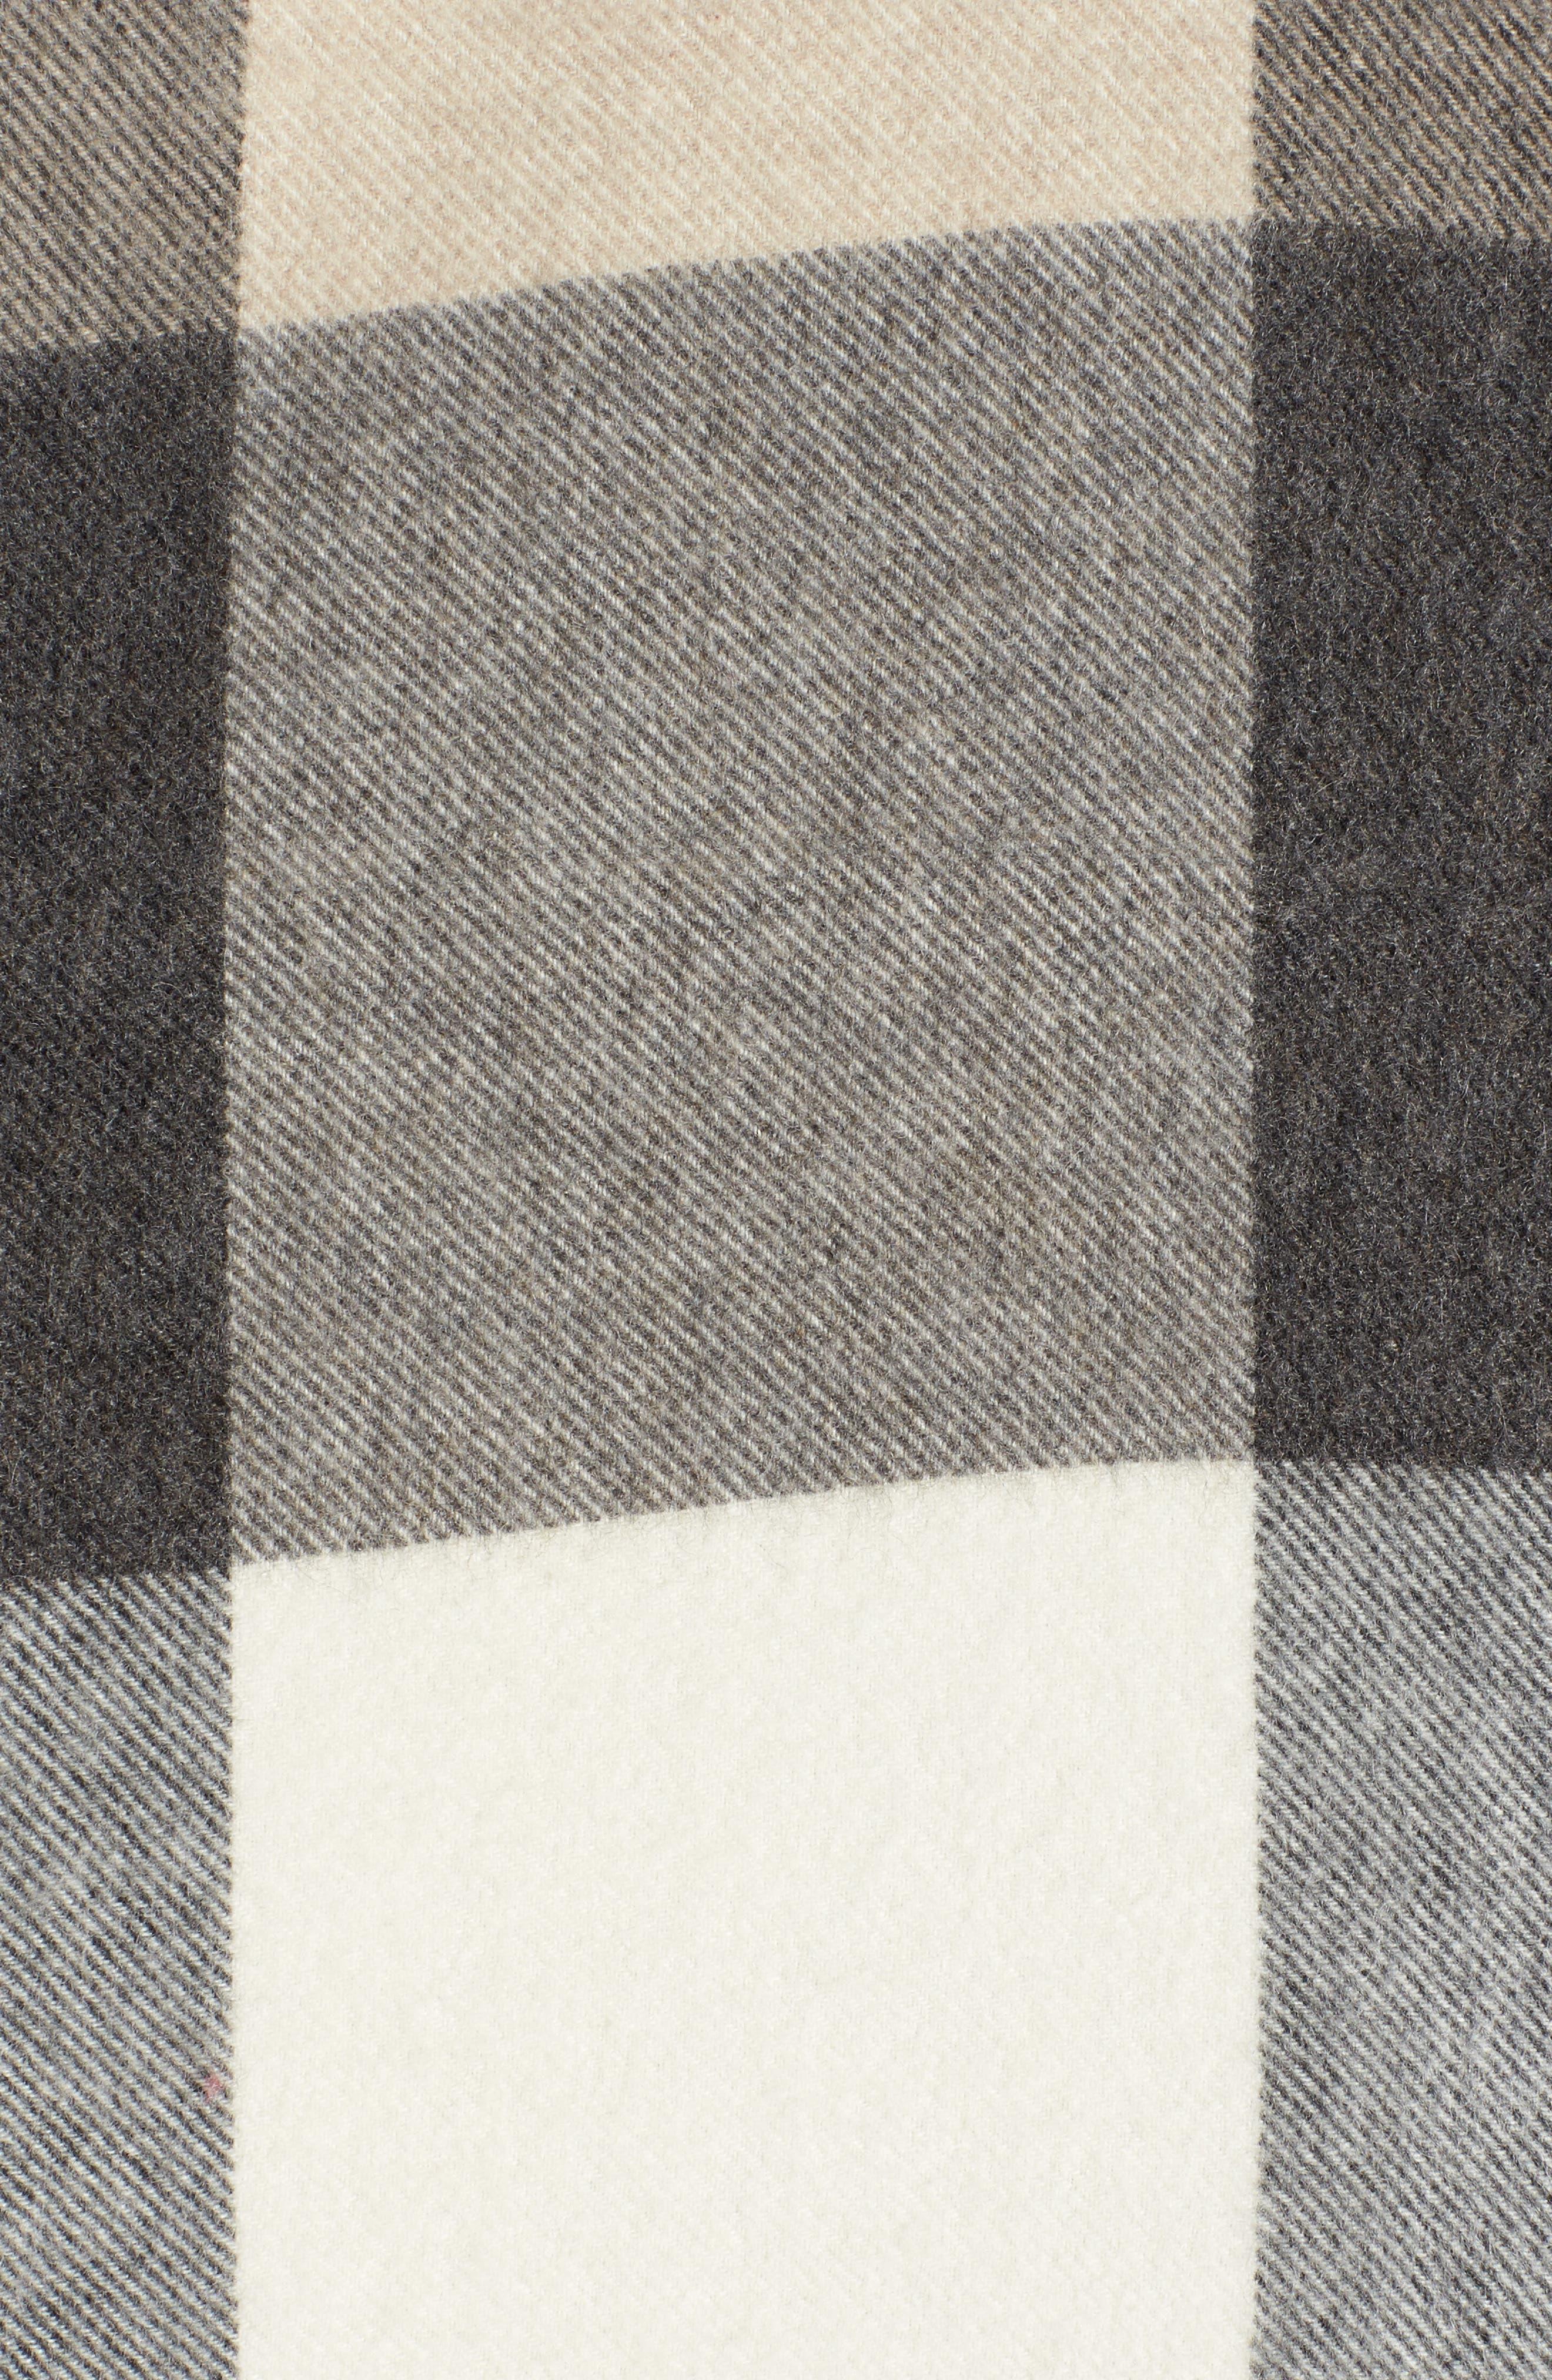 Alternate Image 5  - Nordstrom Buffalo Check Cashmere Wrap